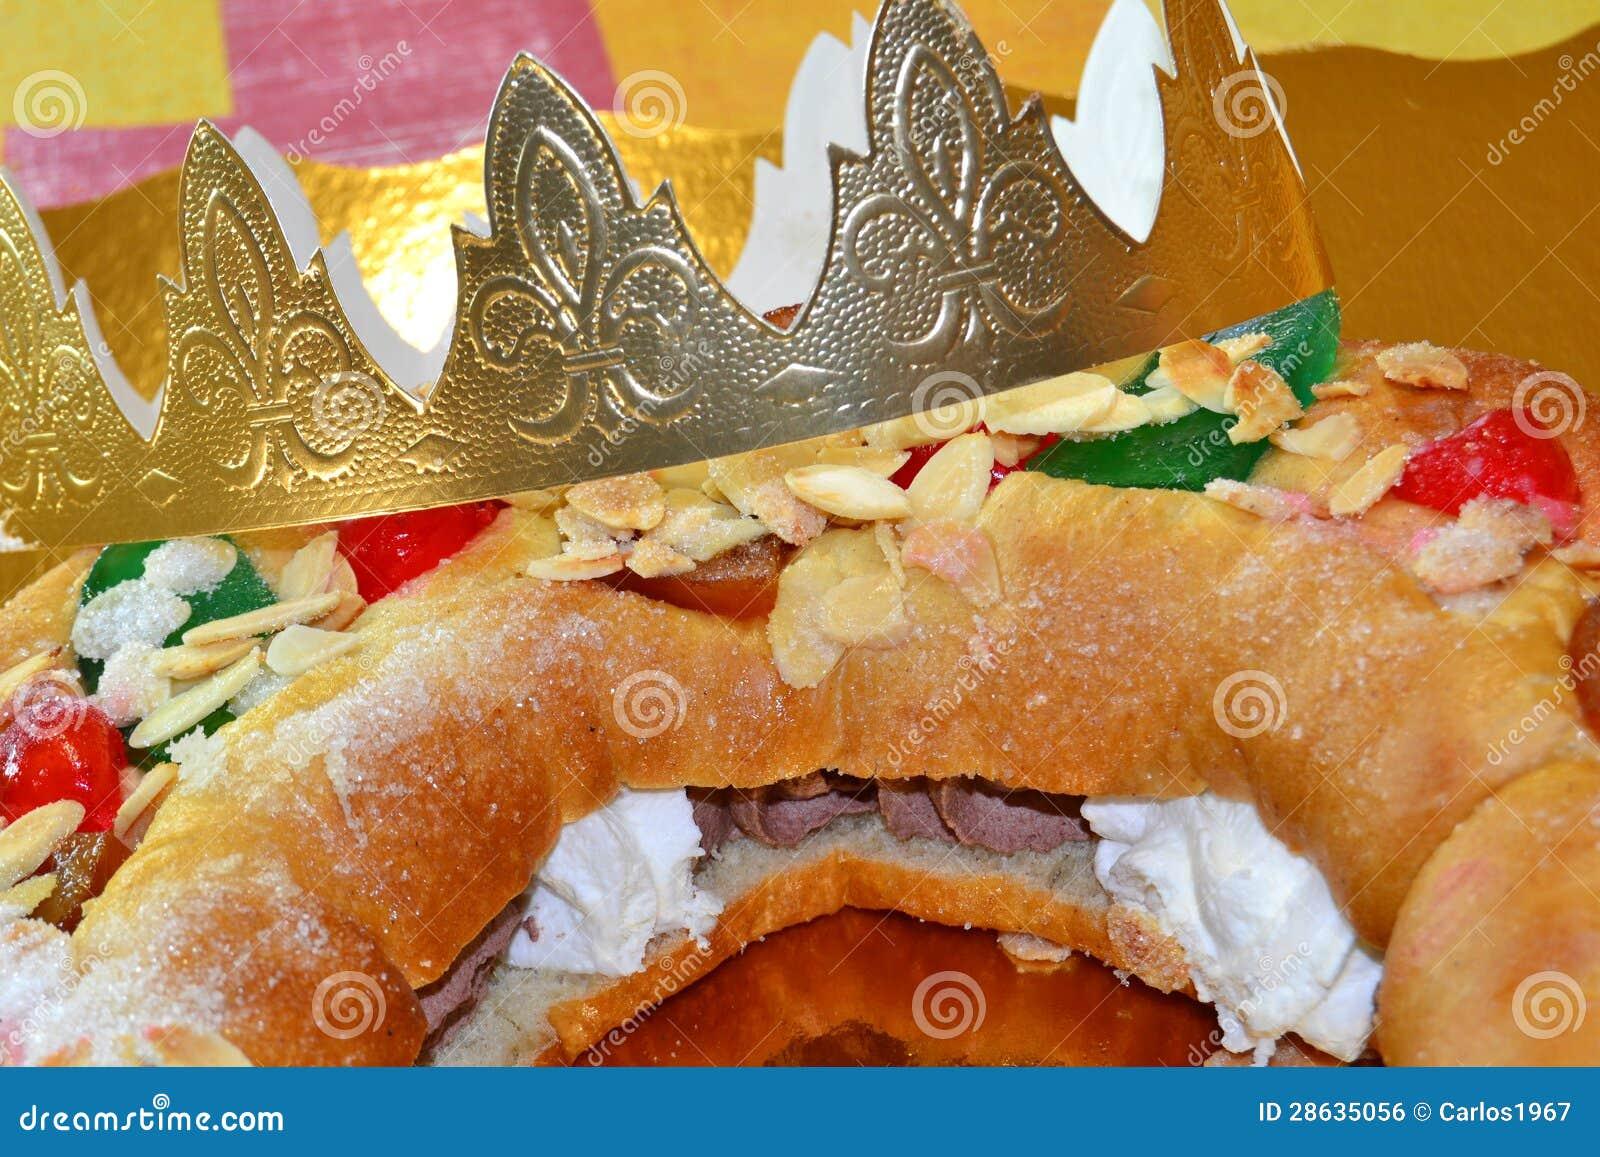 Roscón De Reyes Royalty Free Stock Image